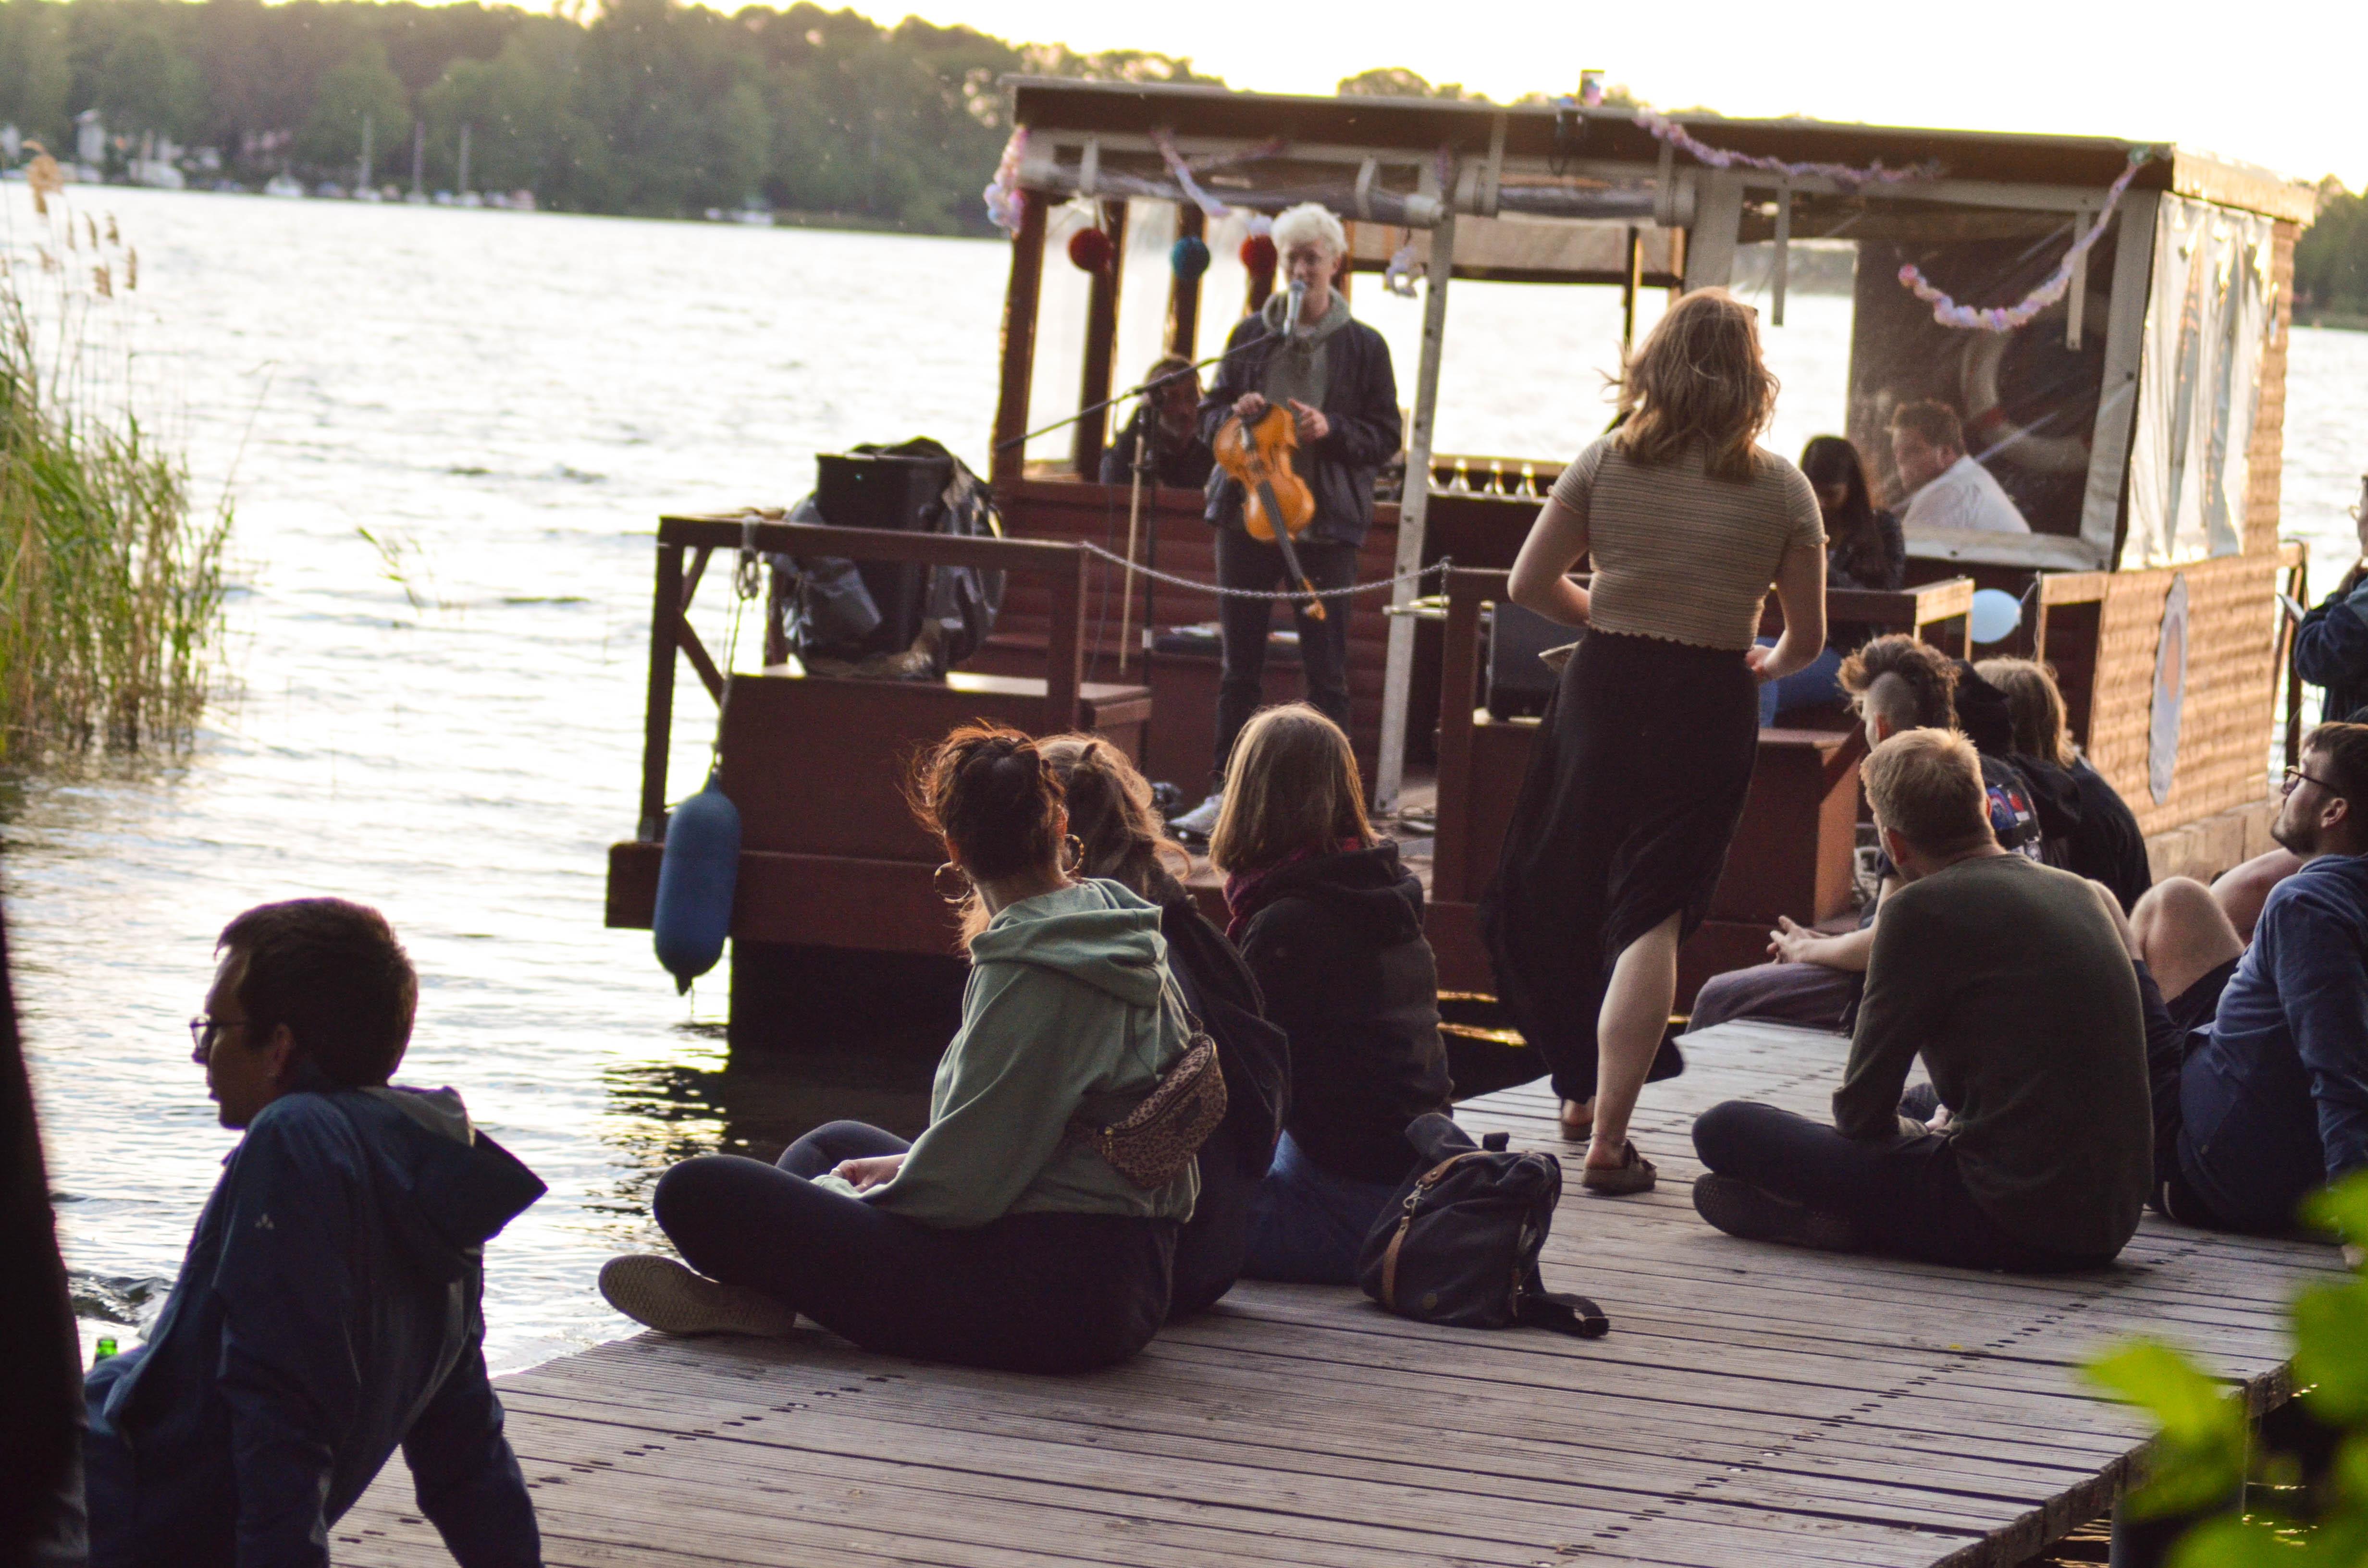 Livemusik vom Floß